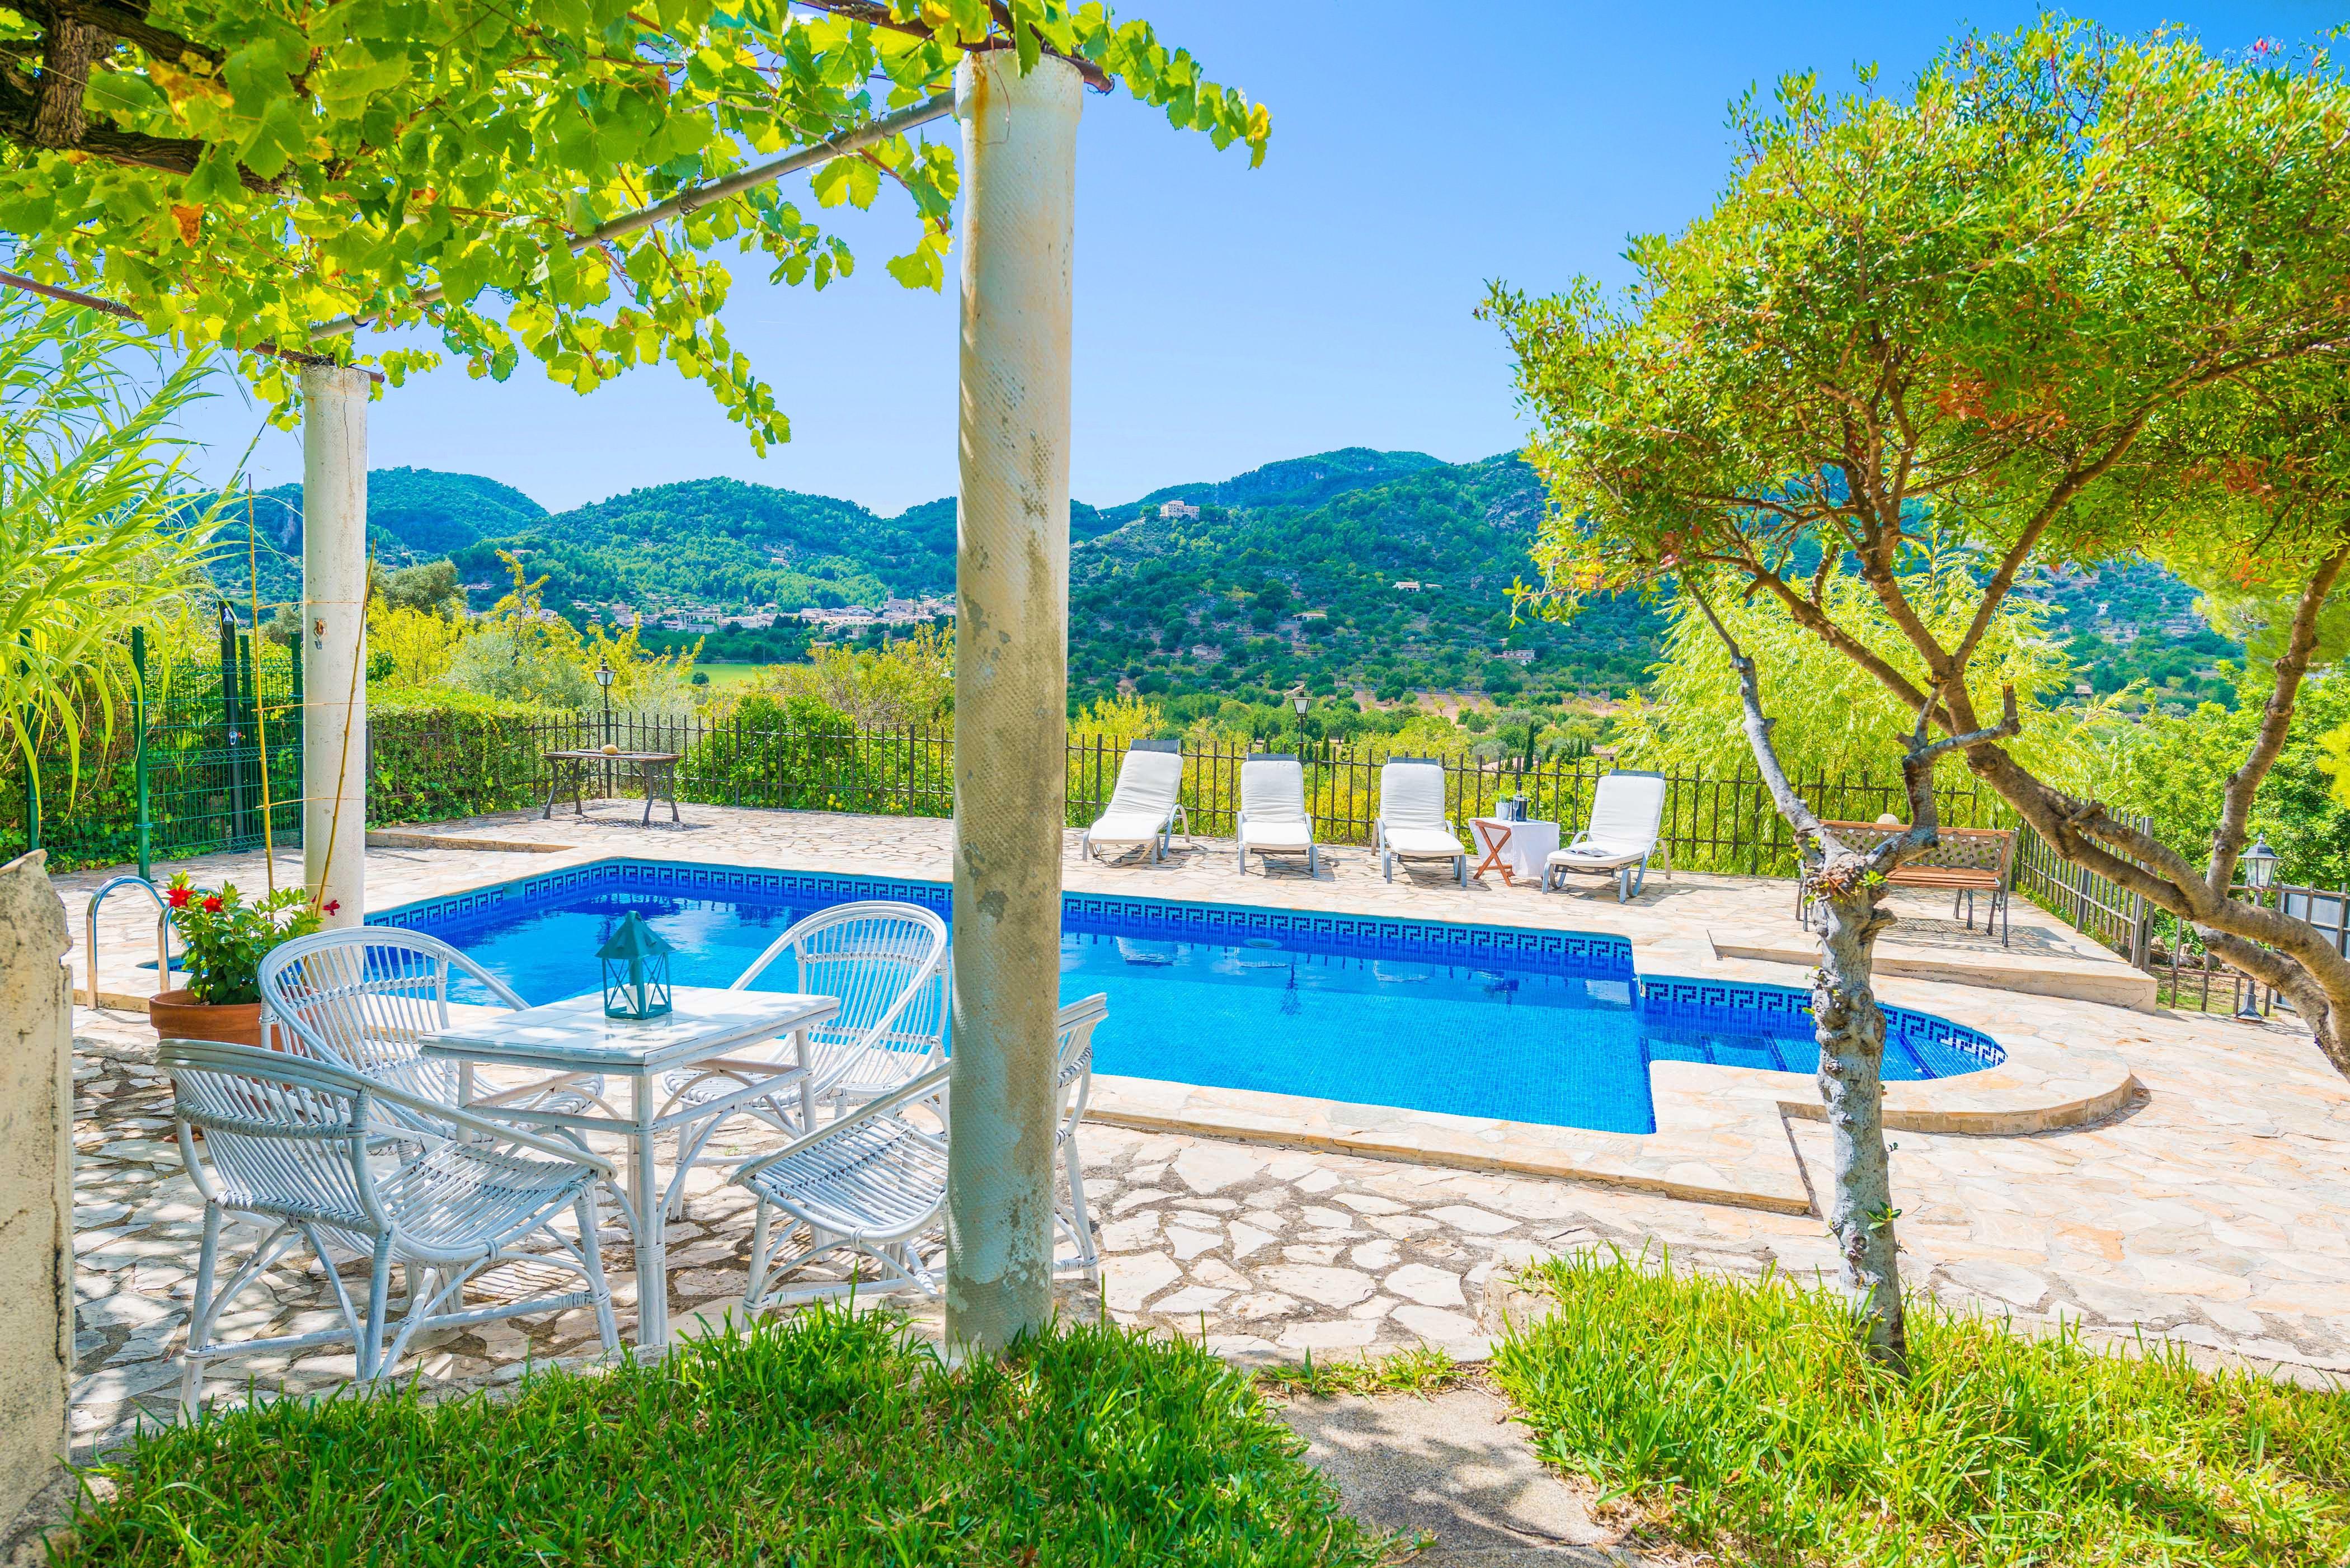 Ferienhaus SON DURINET (2302802), Mancor de la Vall, Mallorca, Balearische Inseln, Spanien, Bild 13